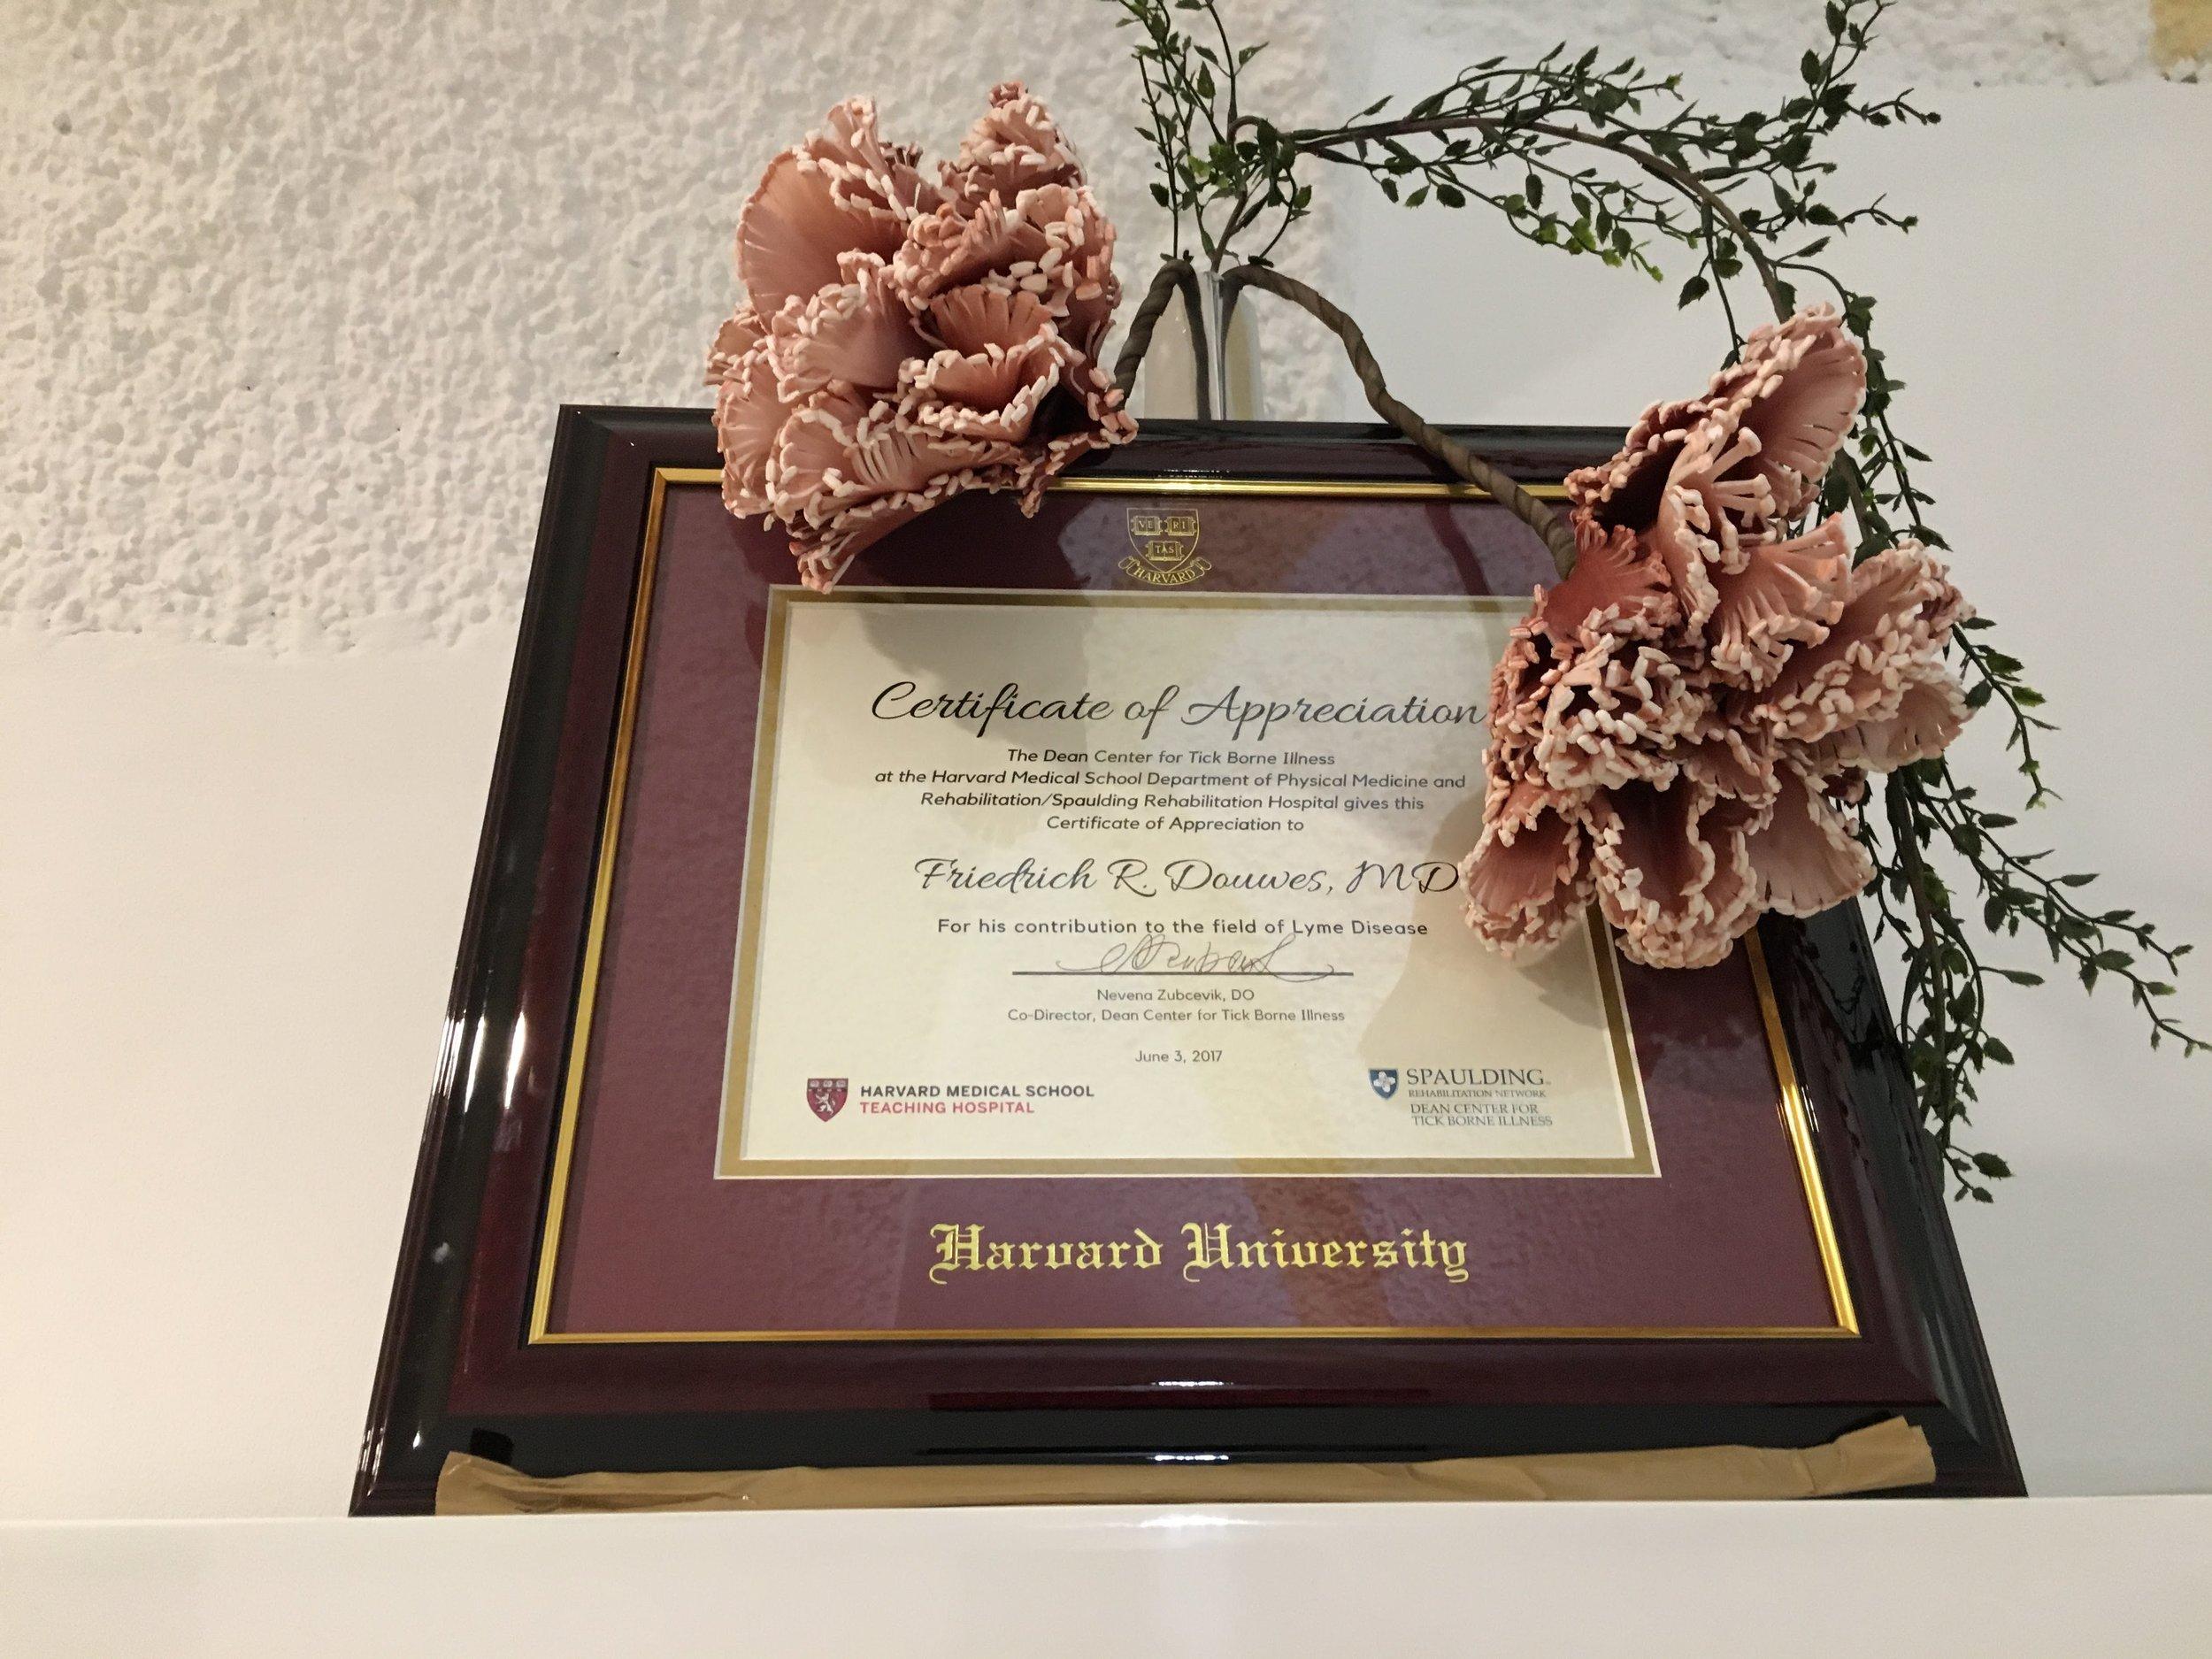 Dr. Friedrich Douwes' Award from Harvard University